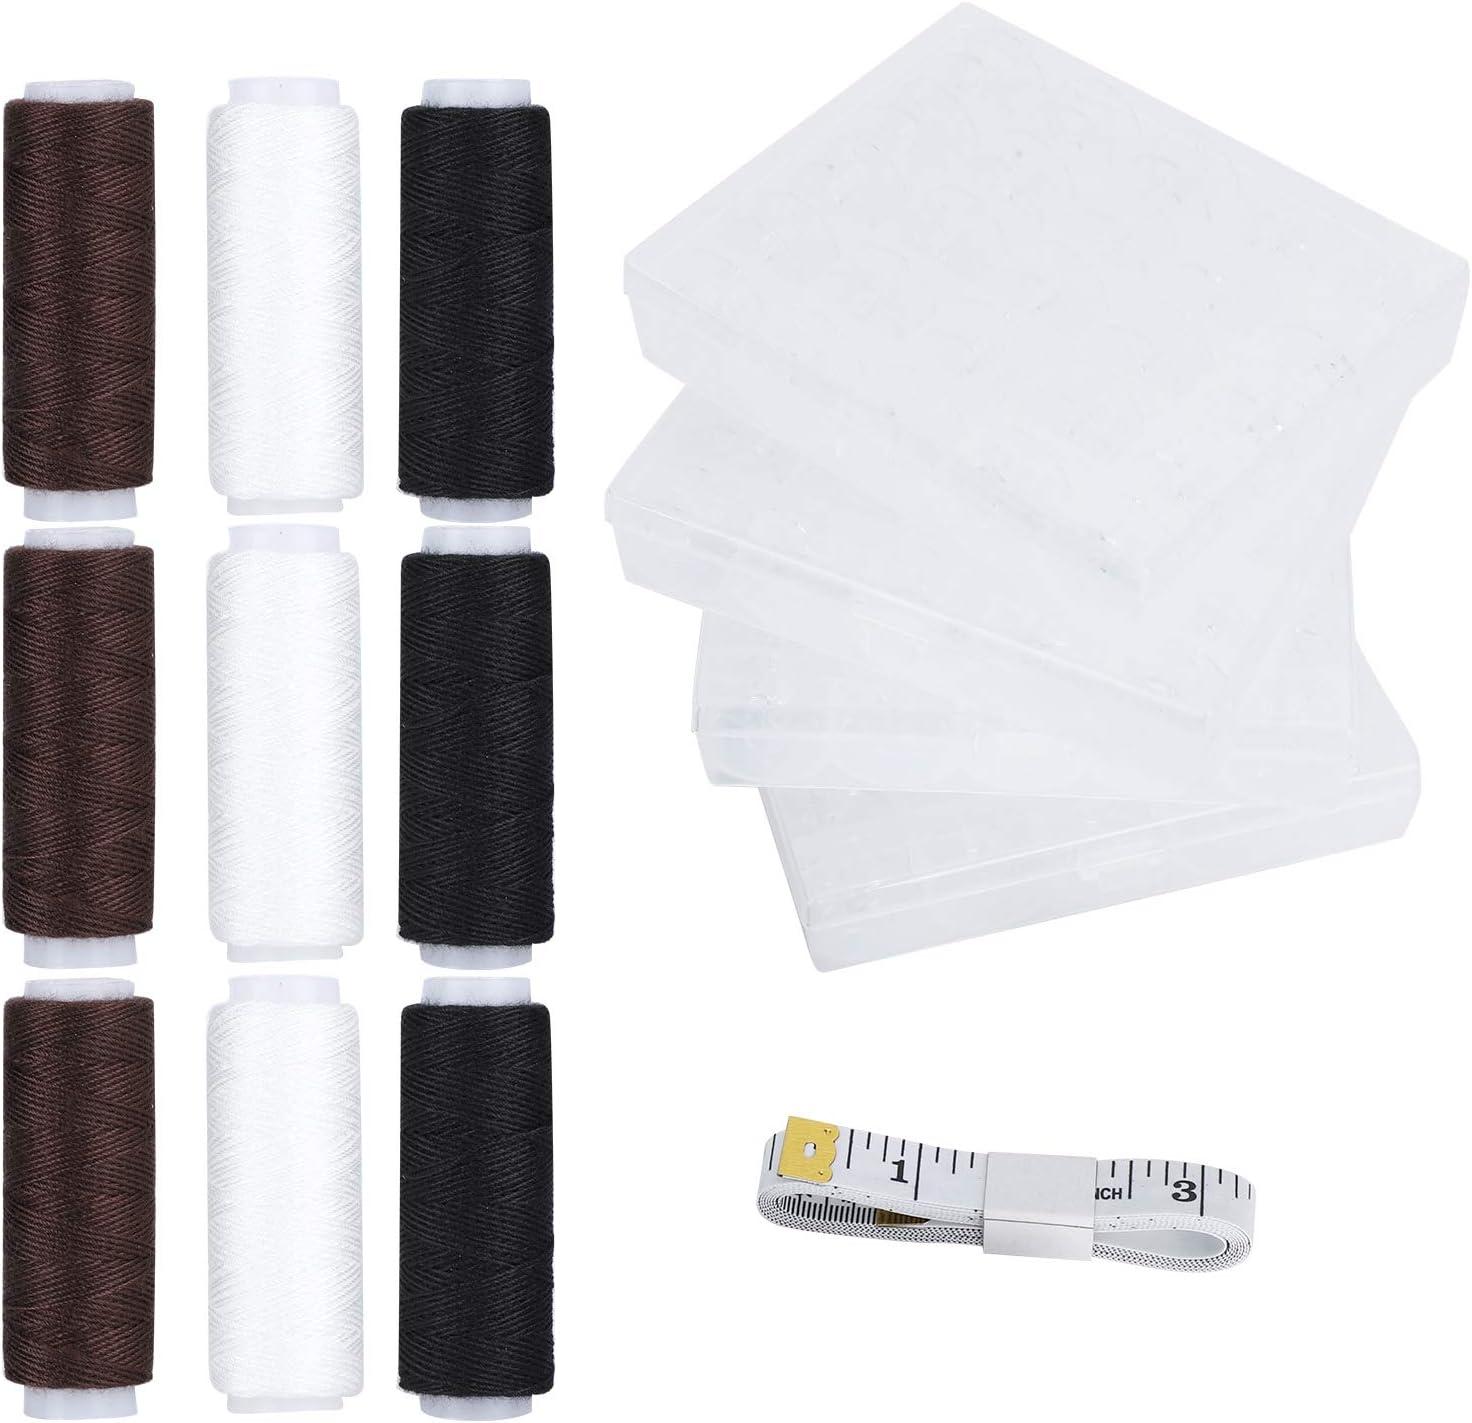 Bobbins Plastic Bobbin Case Superlatite Sewing Transparent Industry No. 1